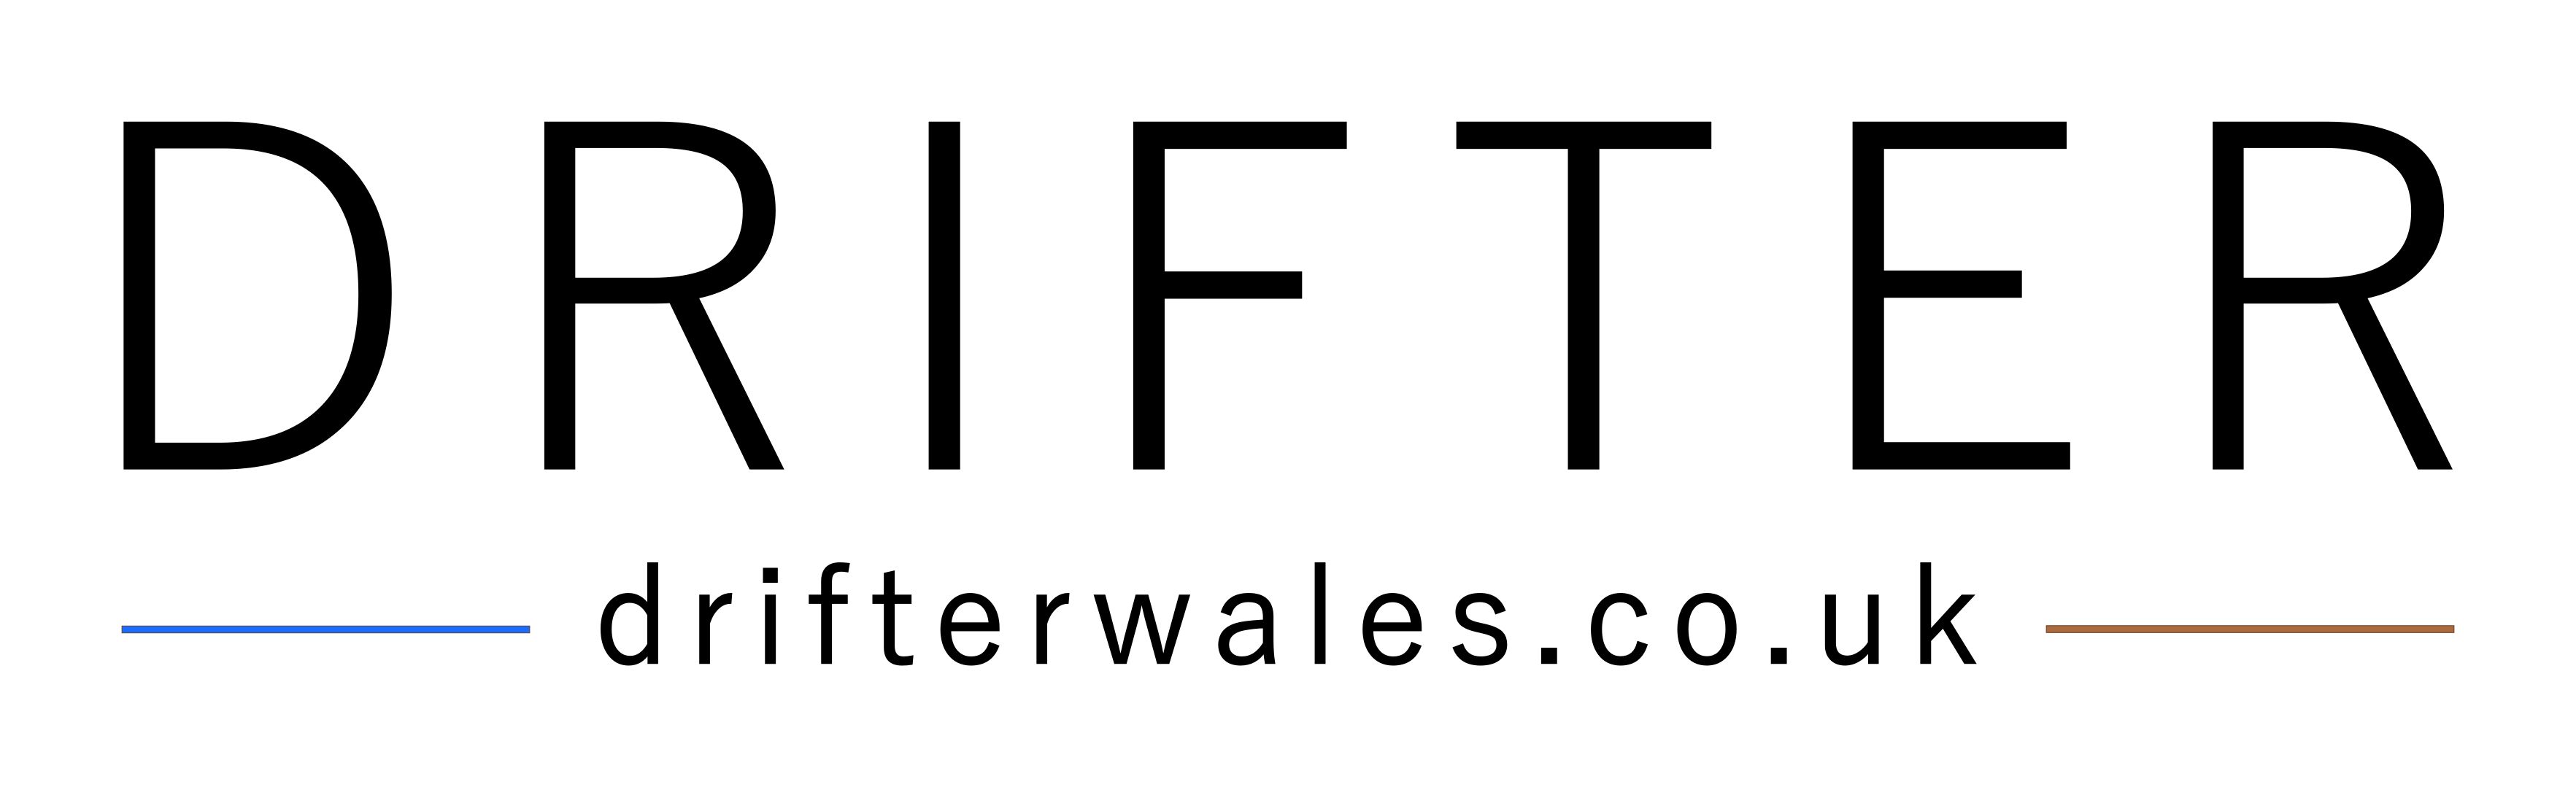 Bespoke Driftwood Home Style | Drifter Wales